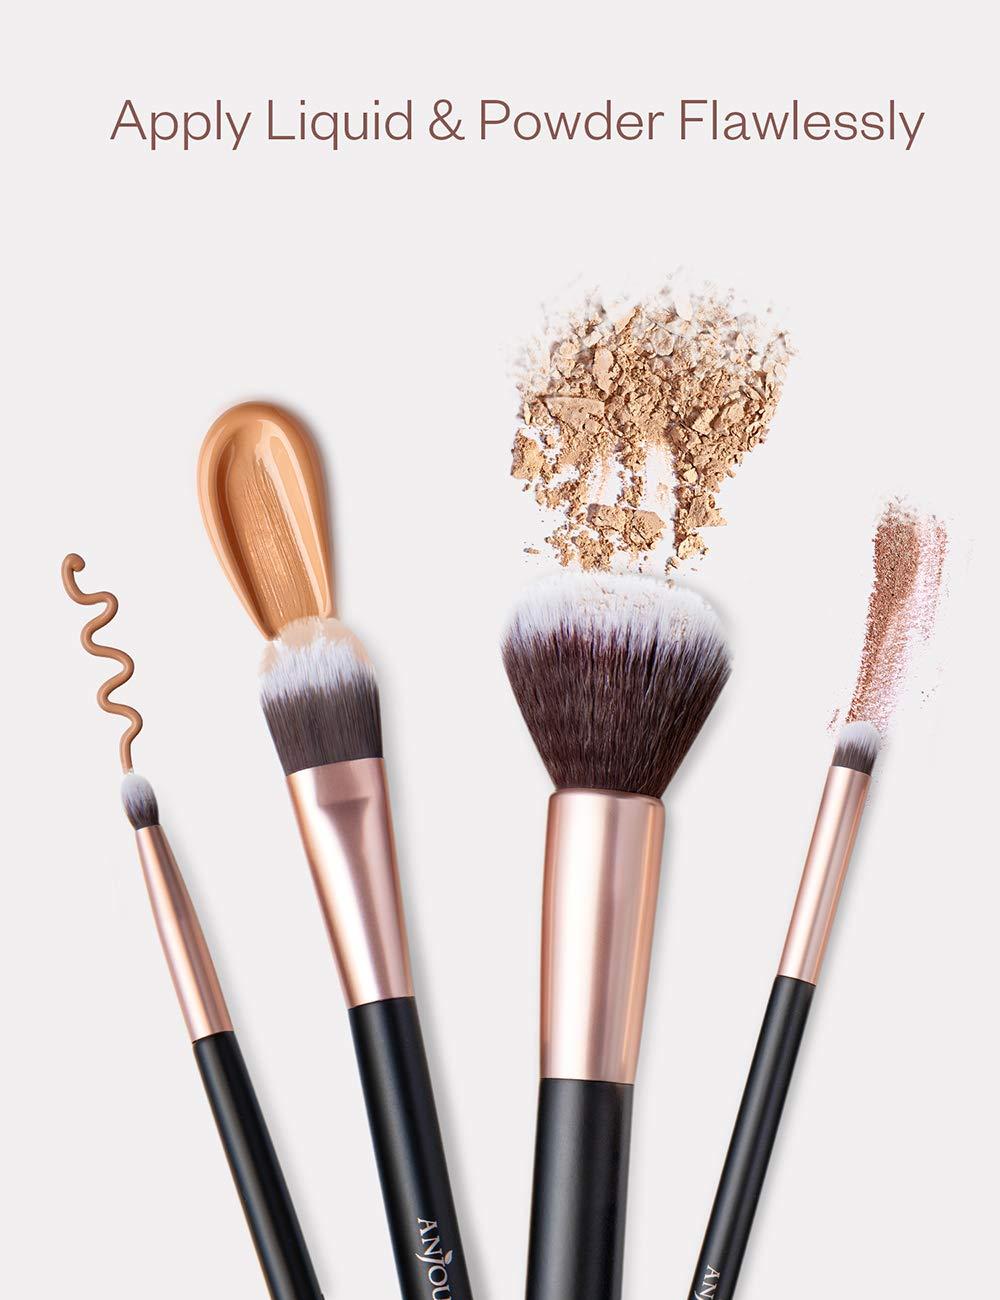 Anjou Makeup Brush Set 24pcs Premium Cosmetic Brushes for Foundation Blending Blush Concealer Eye